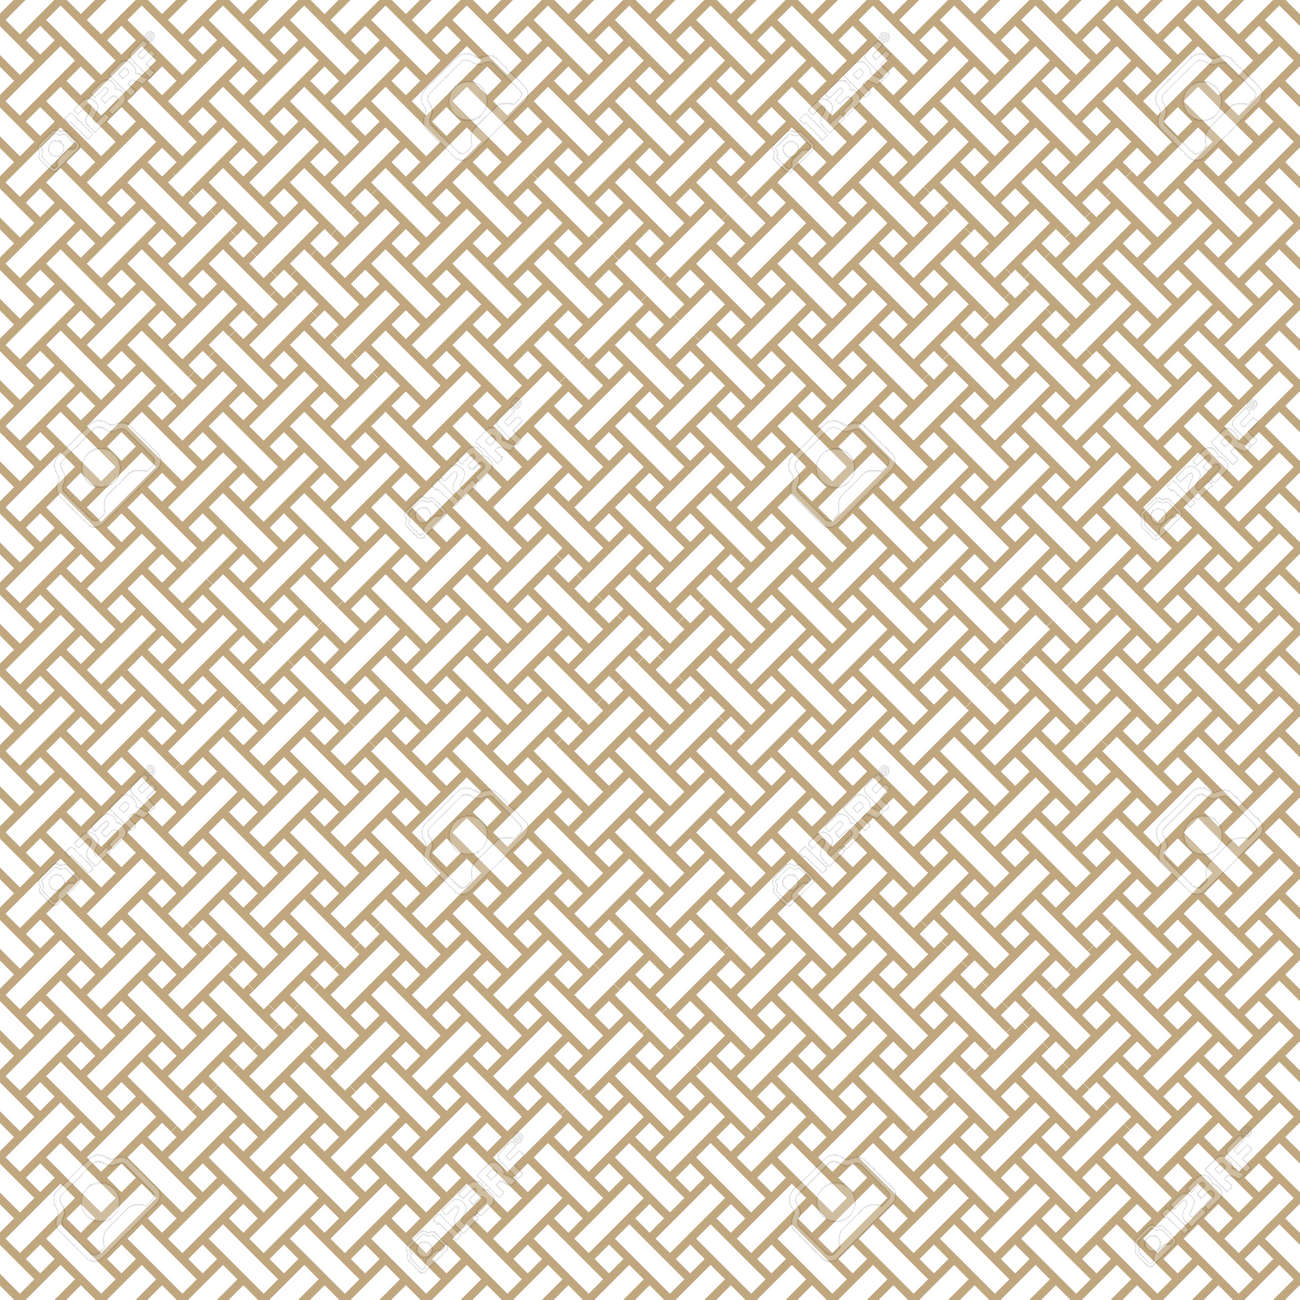 Seamless simple gold geometric pattern. Vector linear modern texture. - 151009445